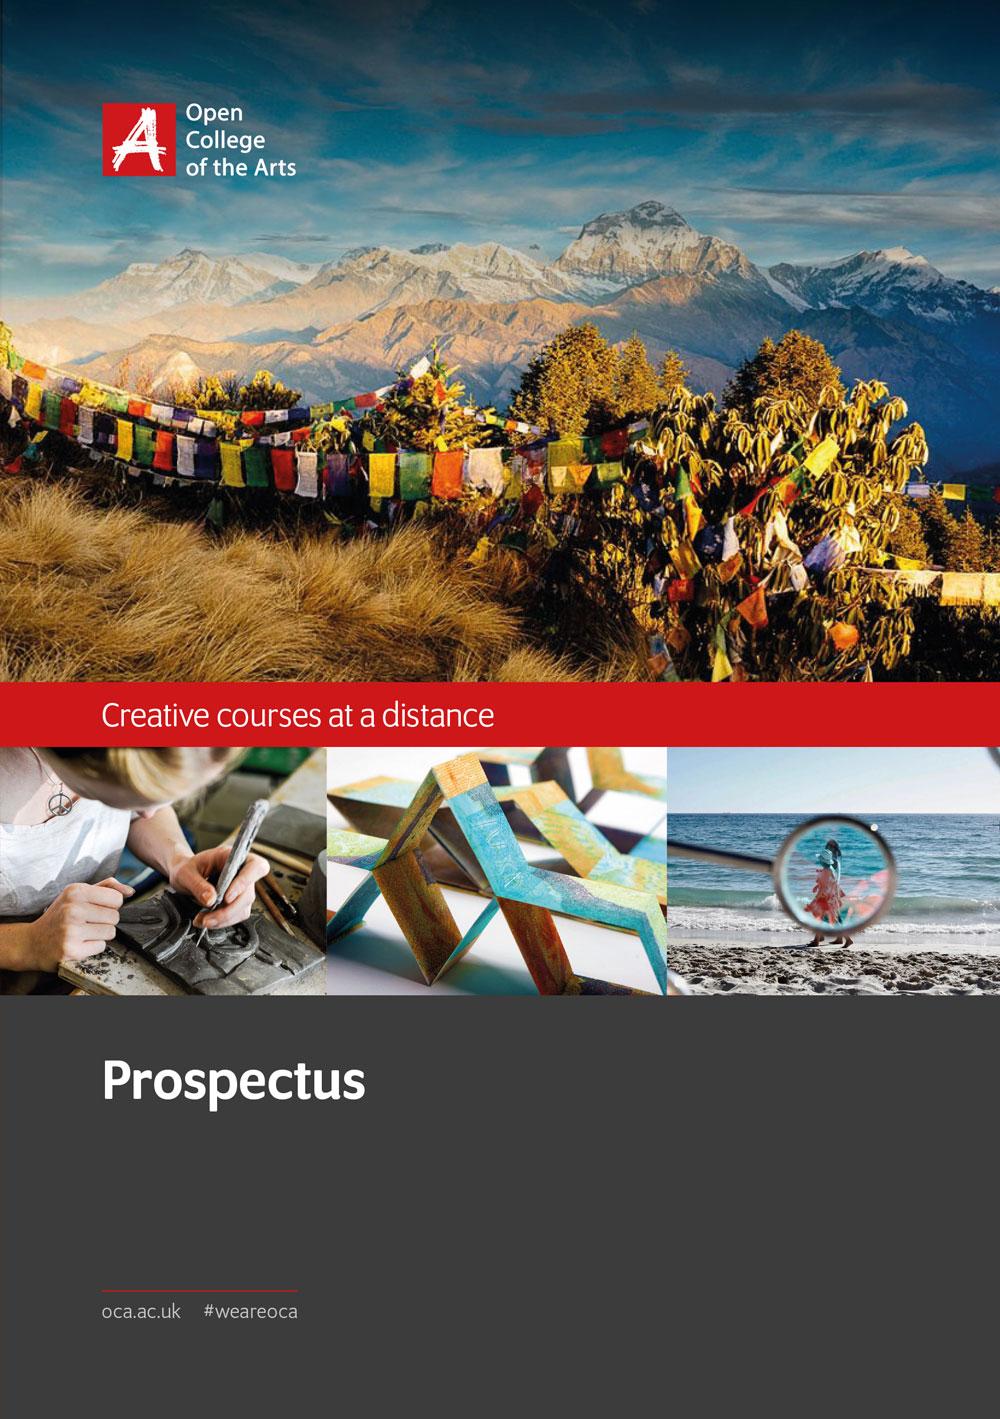 Open College of the Arts prospectus cover design